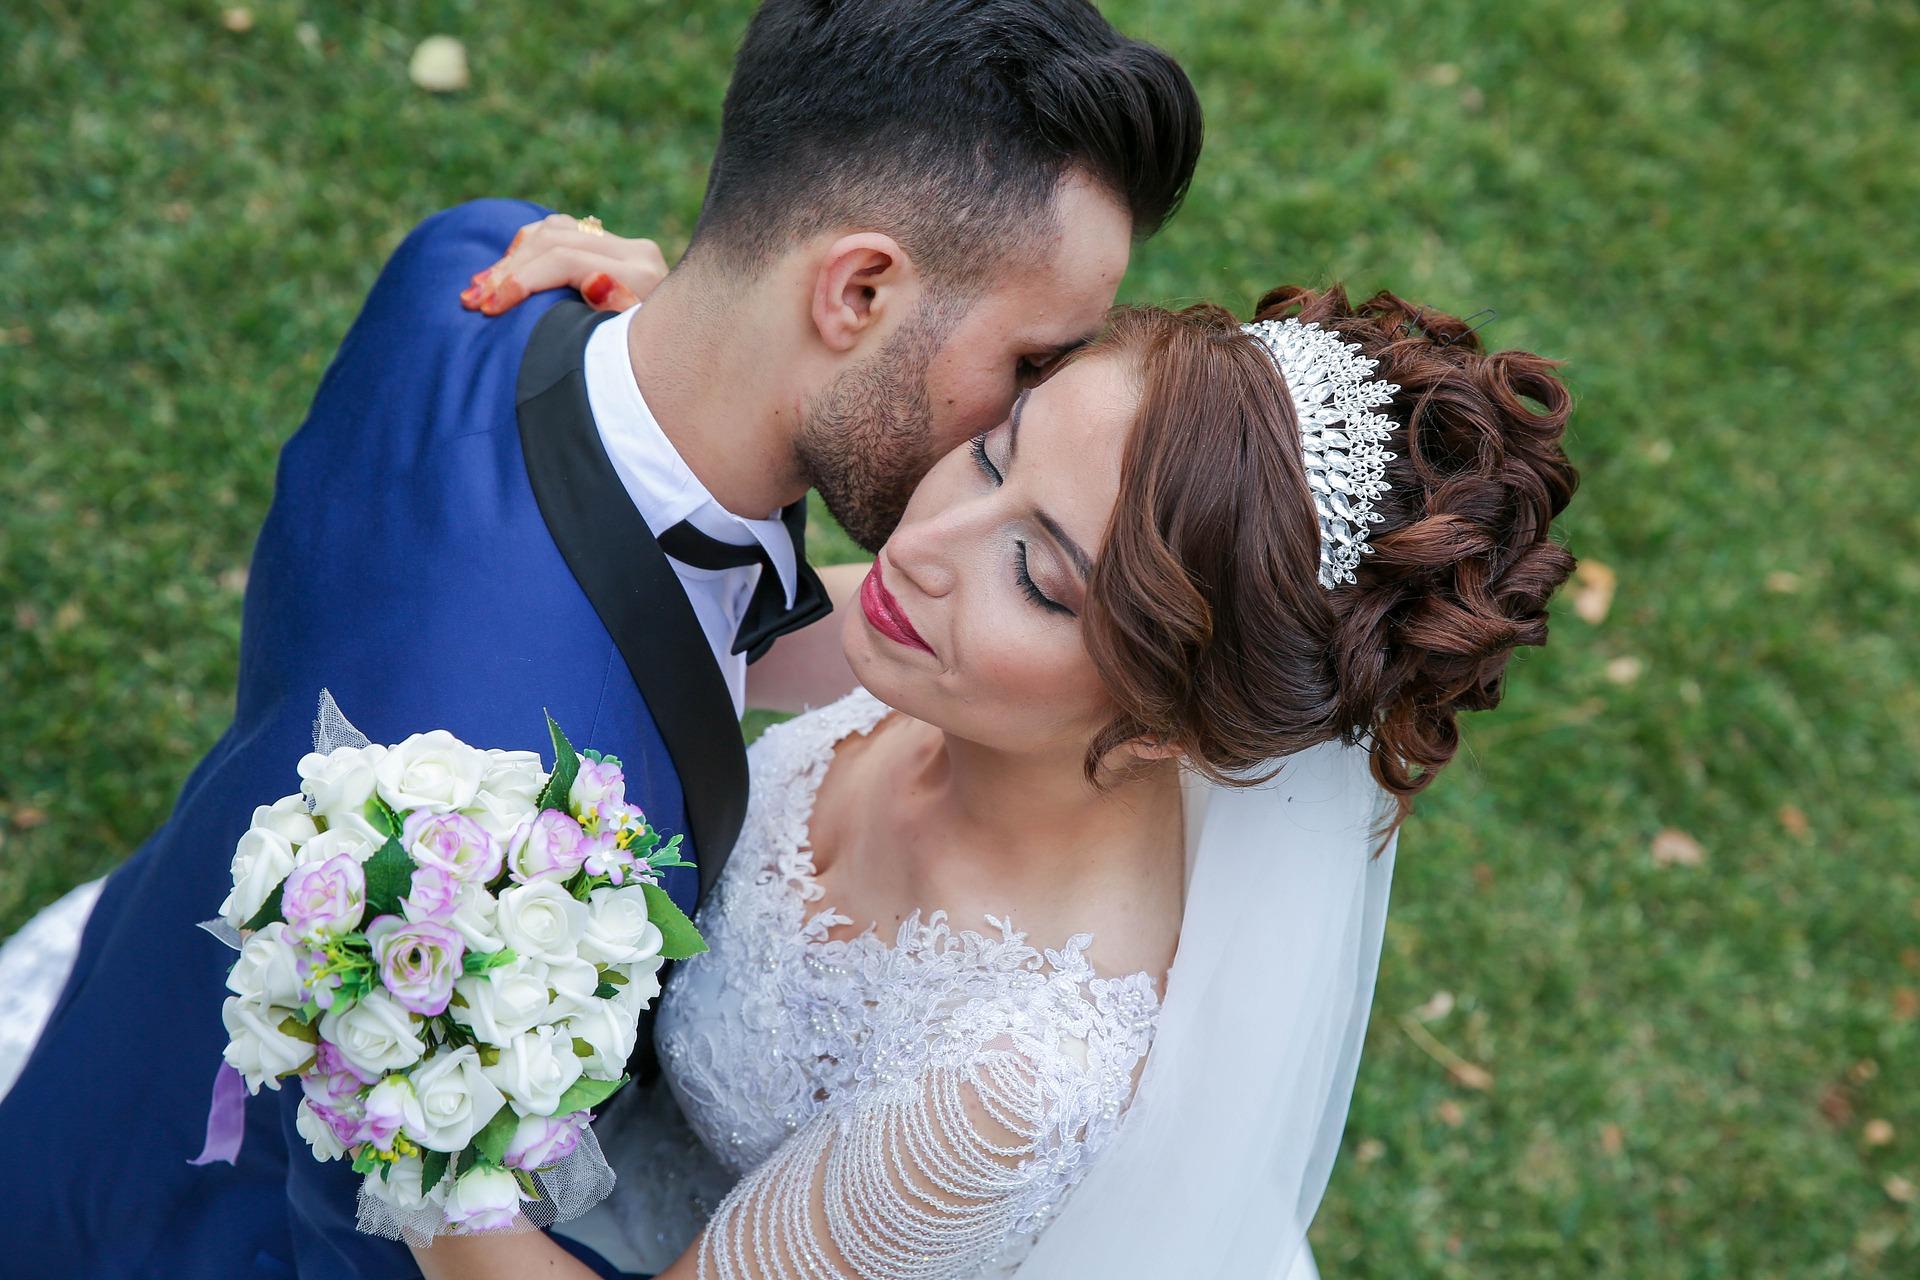 persian wedding bride and groom